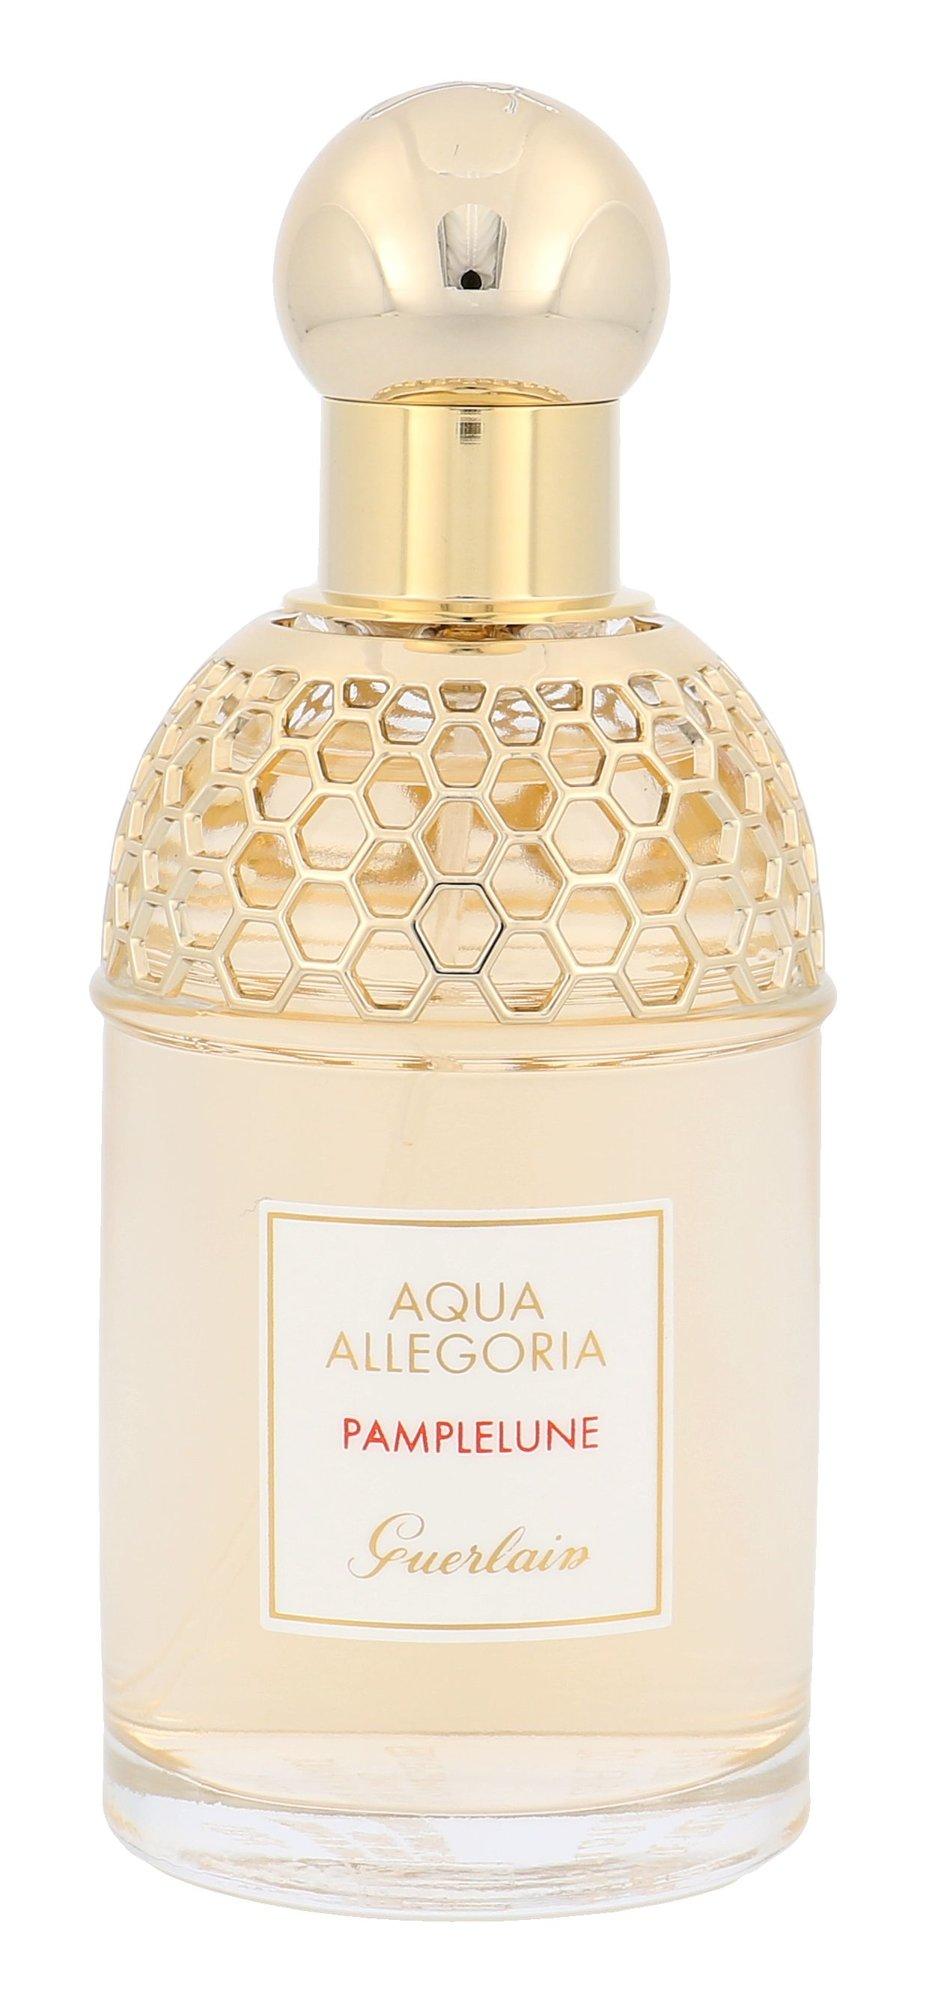 Guerlain Aqua Allegoria Pamplelune EDT 75ml